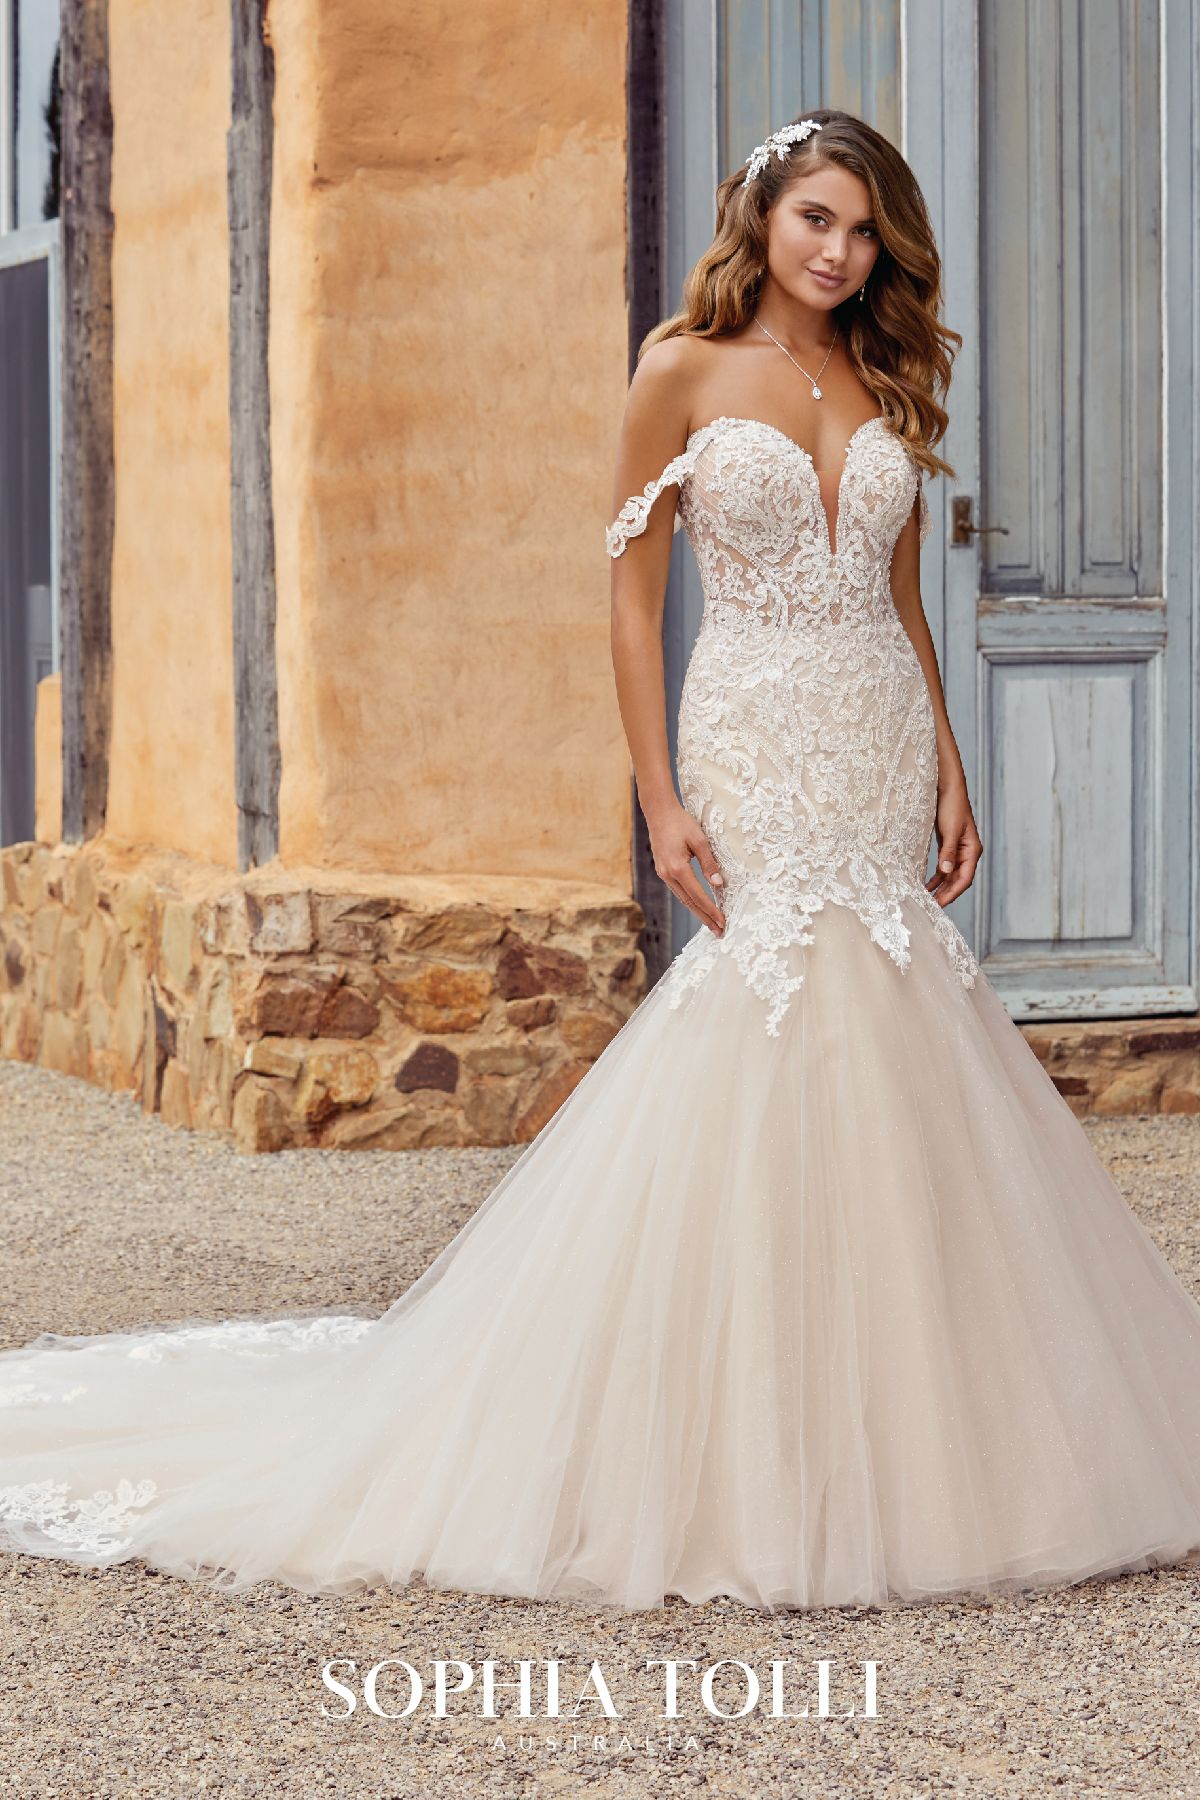 London Style Y22065 Sophia Tolli Wedding Gowns Mermaid Glitter Tulle Veil Tulle Veils [ 1800 x 1200 Pixel ]